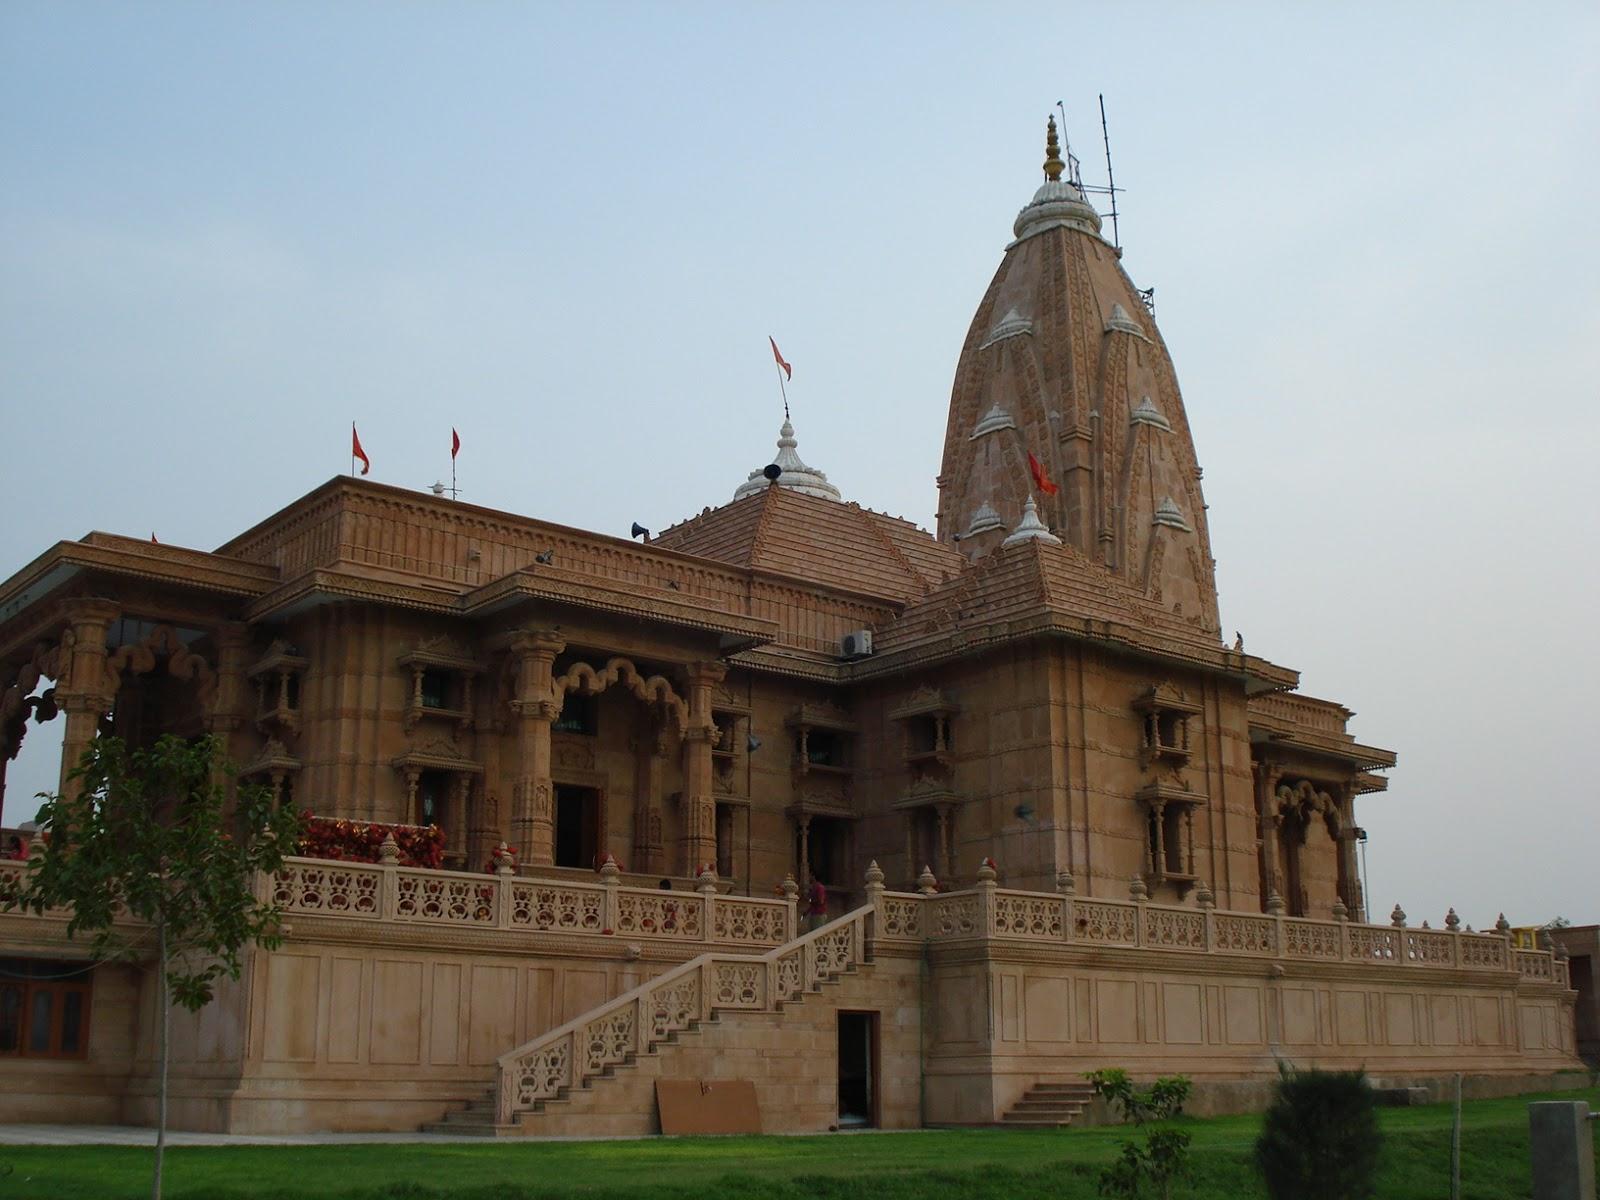 Hanumangarh India  City pictures : ... India: India Travel Sardarsahar Hanumangarh Rajasthan India